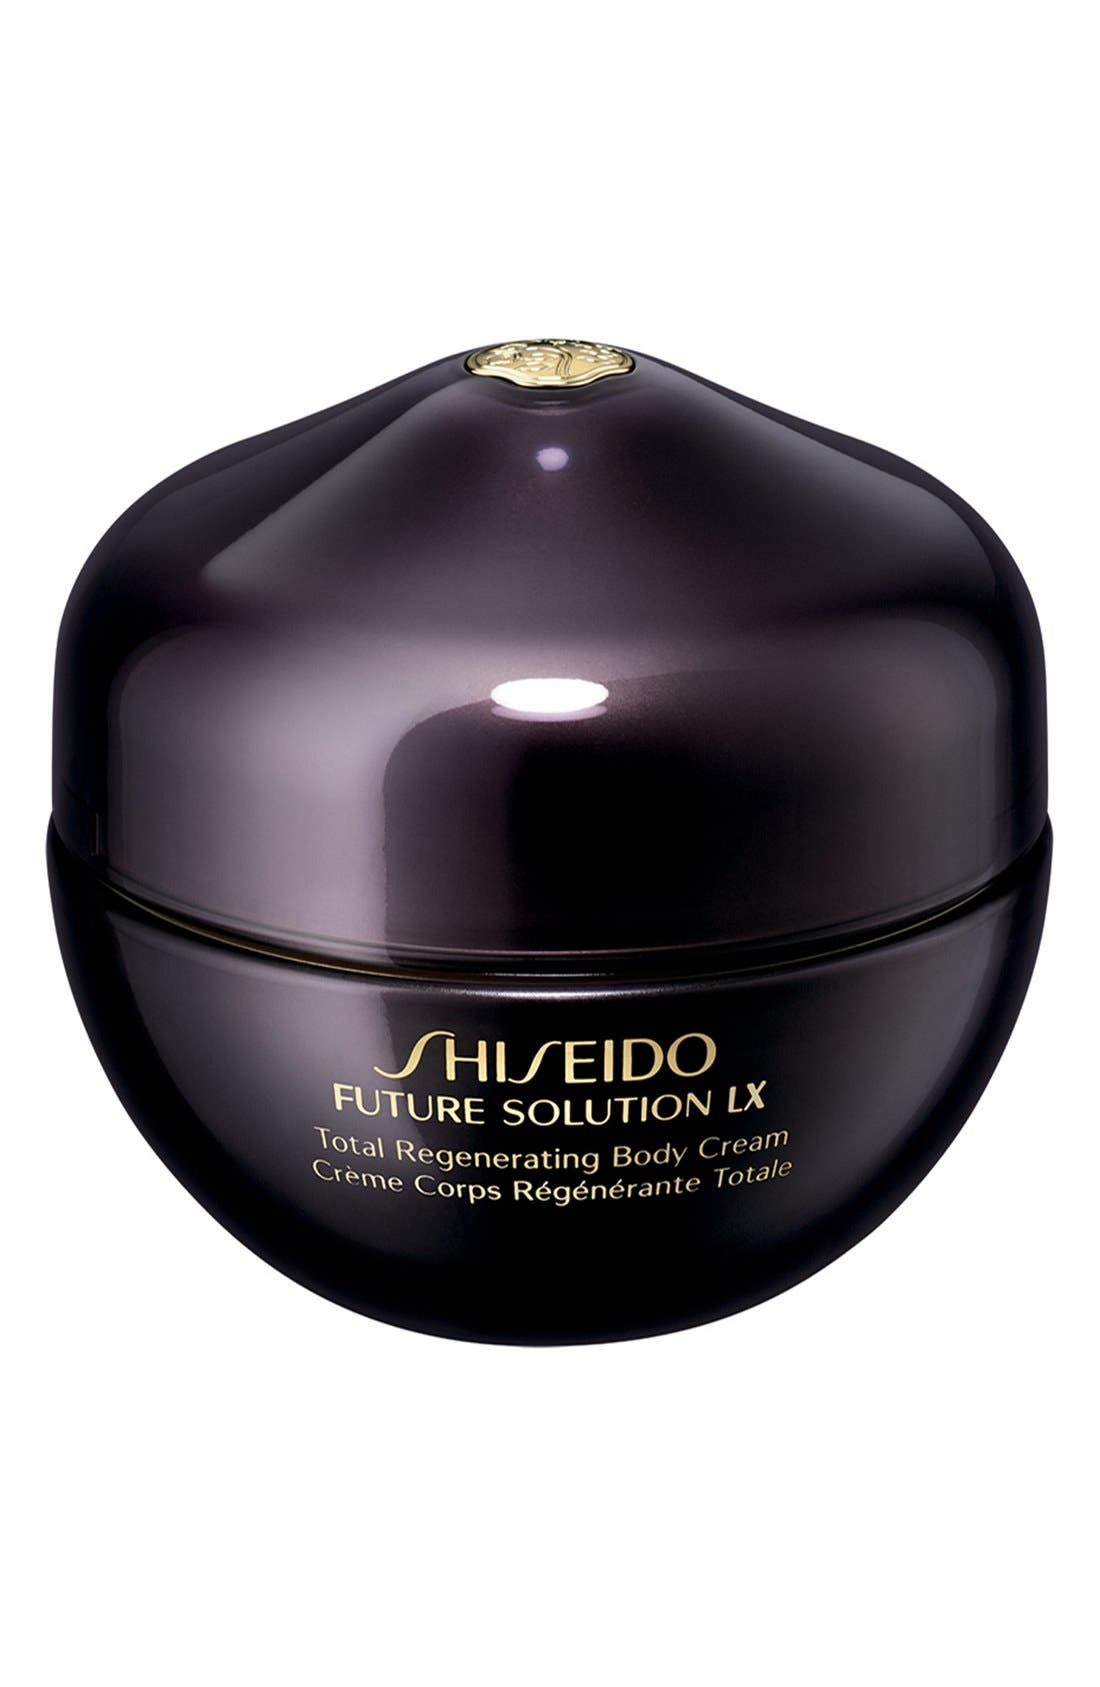 Shiseido 'Future Solution LX' Total Regenerating Body Cream